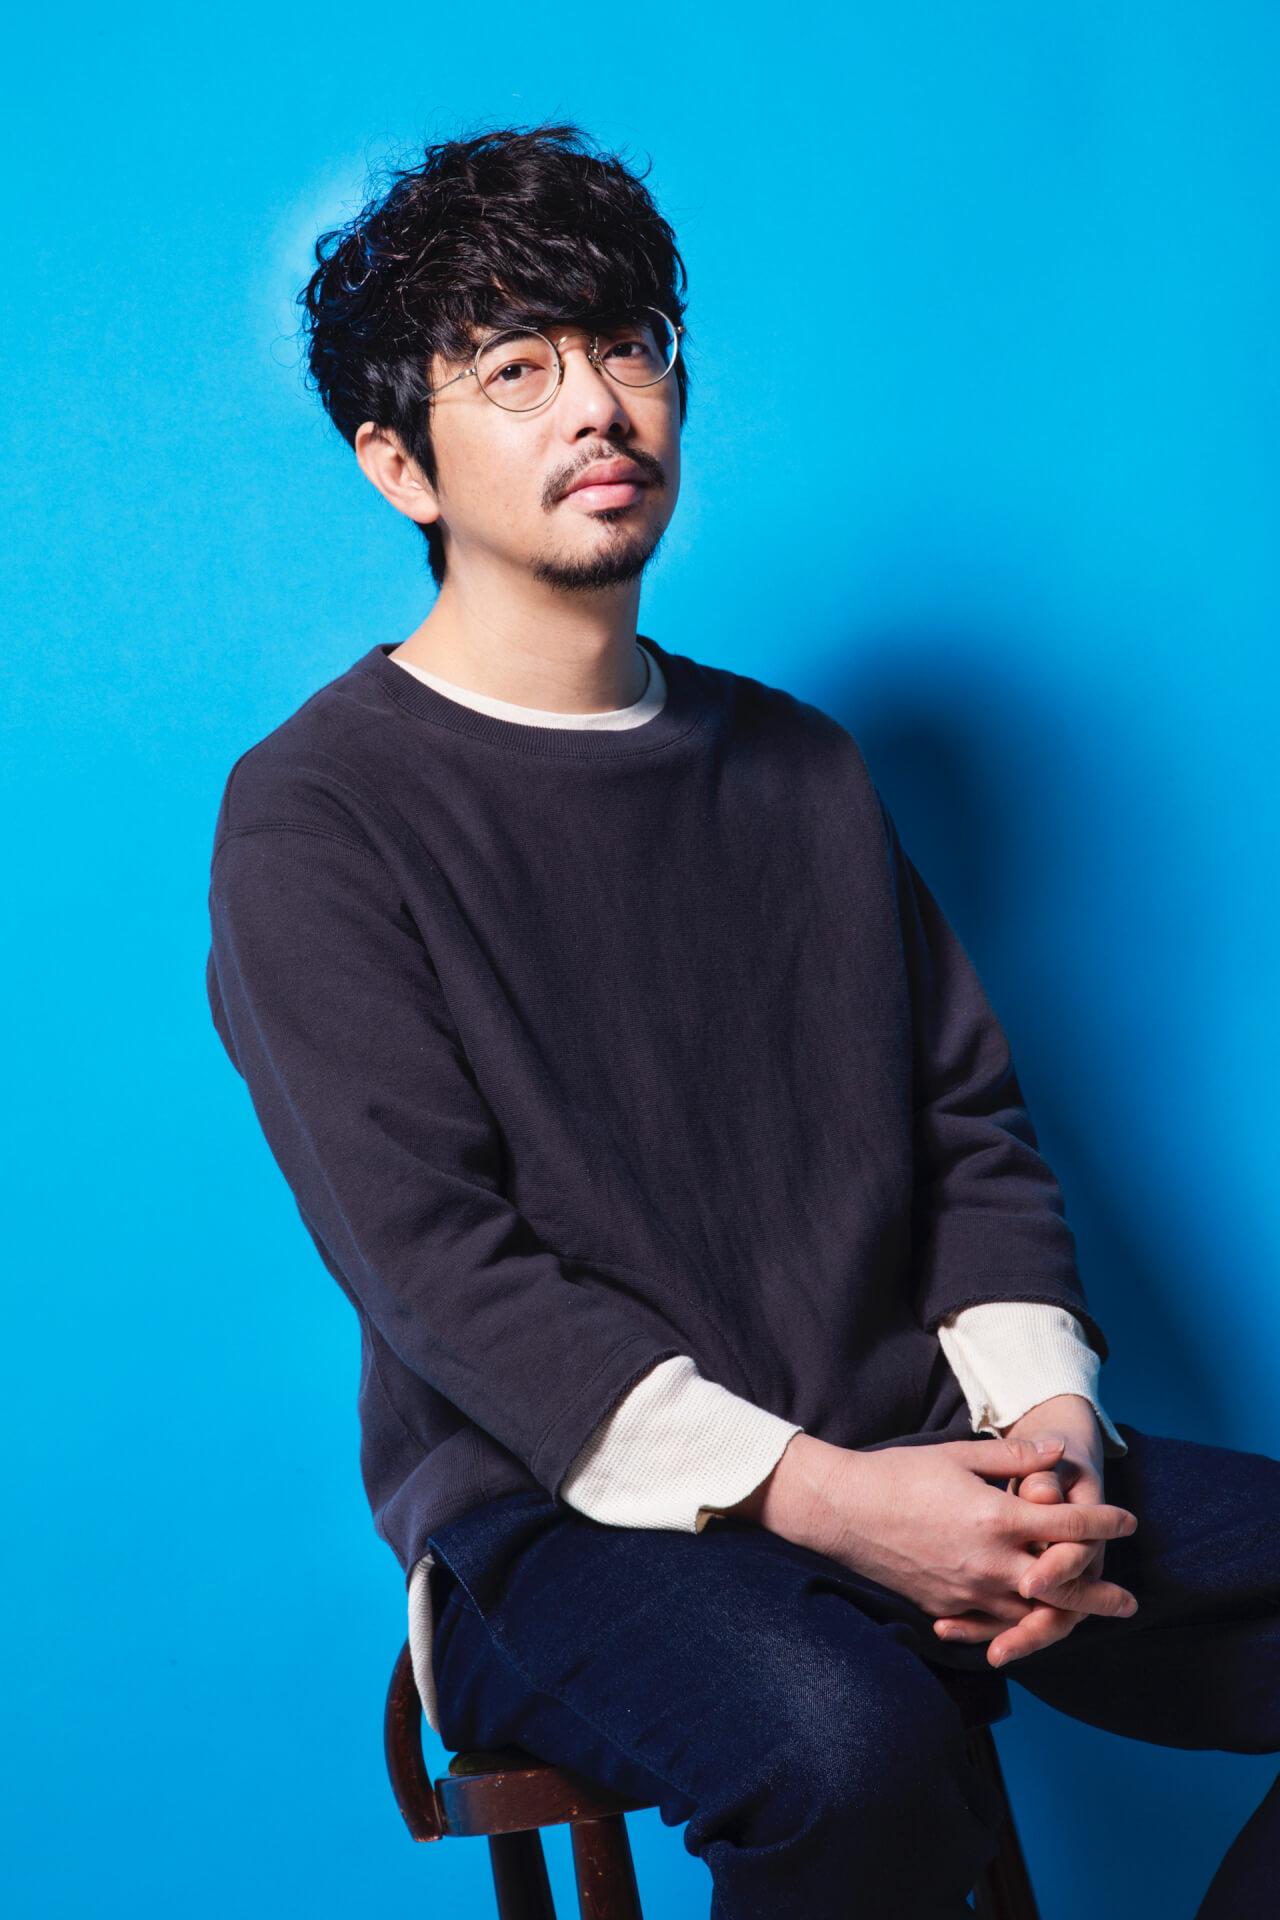 「APPLE VINEGAR -Music Award-」2020年はAAAMYYY、Daichi Yamamotoら計10組がノミネート!特設サイトも本日からオープン music200210_applevinegarmusicaward_02